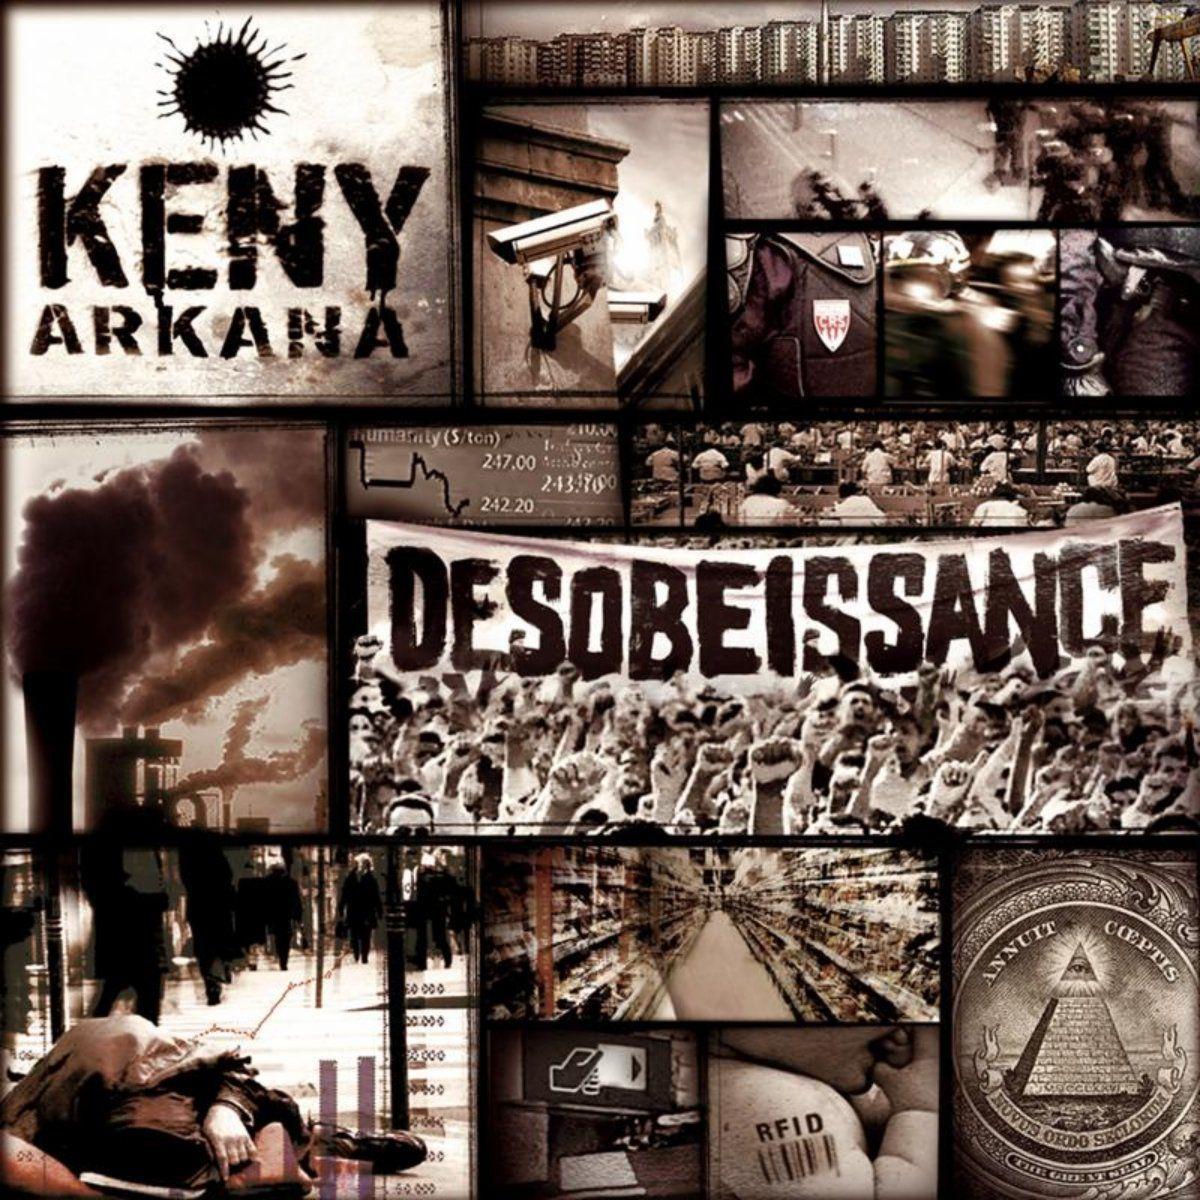 Keny Arkana - Désobéissance - le rap c'était mieux avant